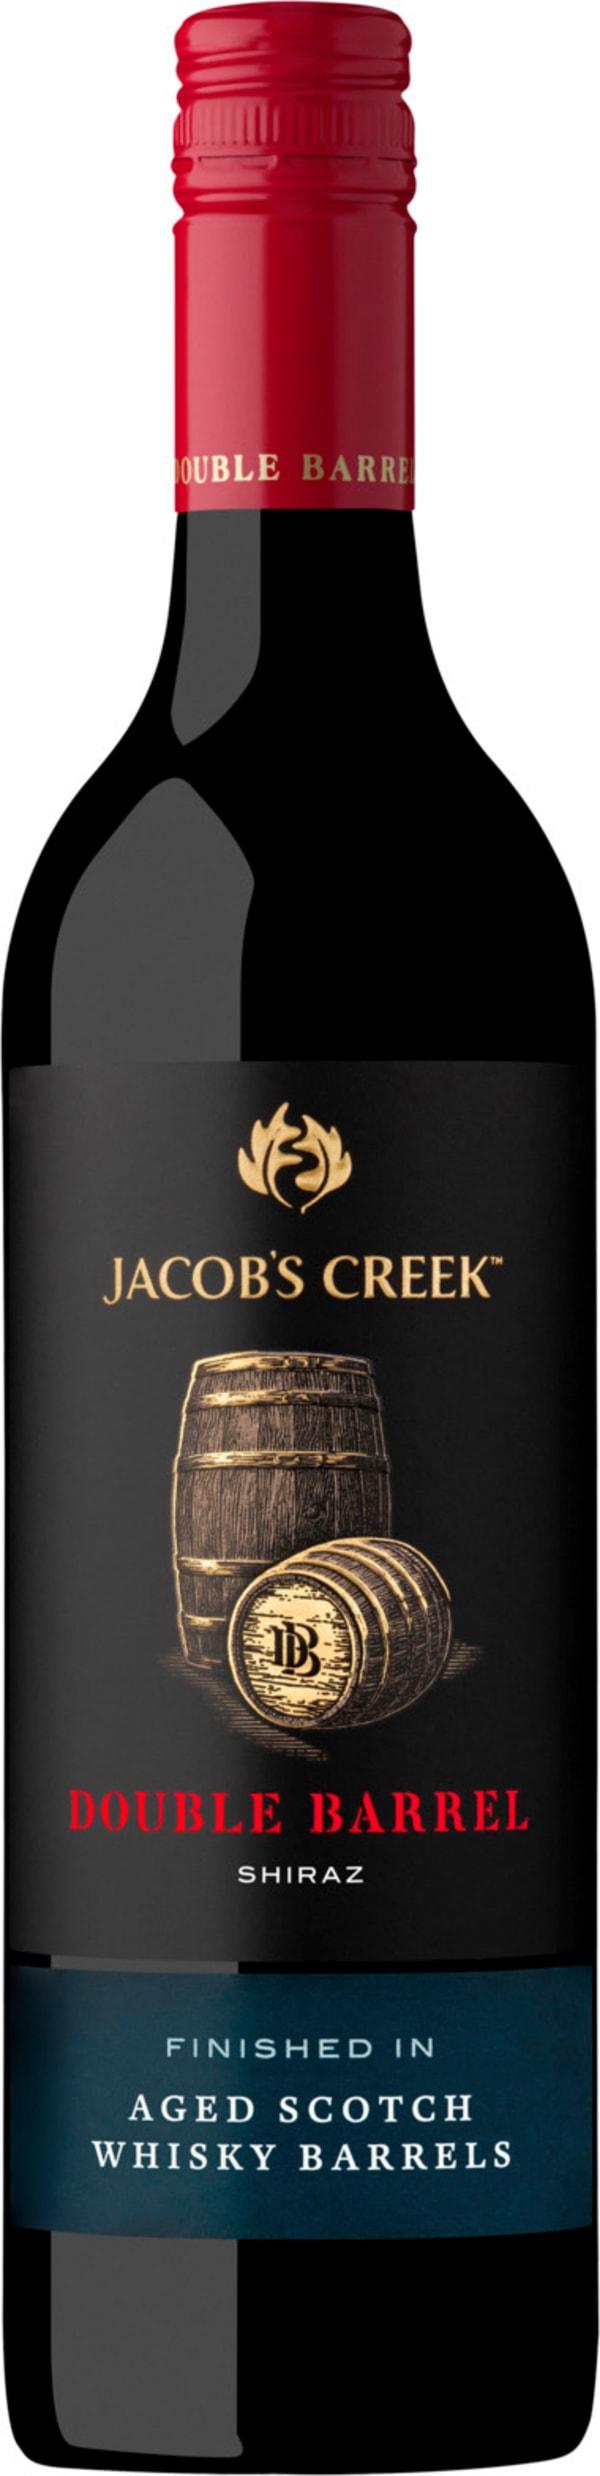 Jacob's Creek Double Barrel Shiraz 2018